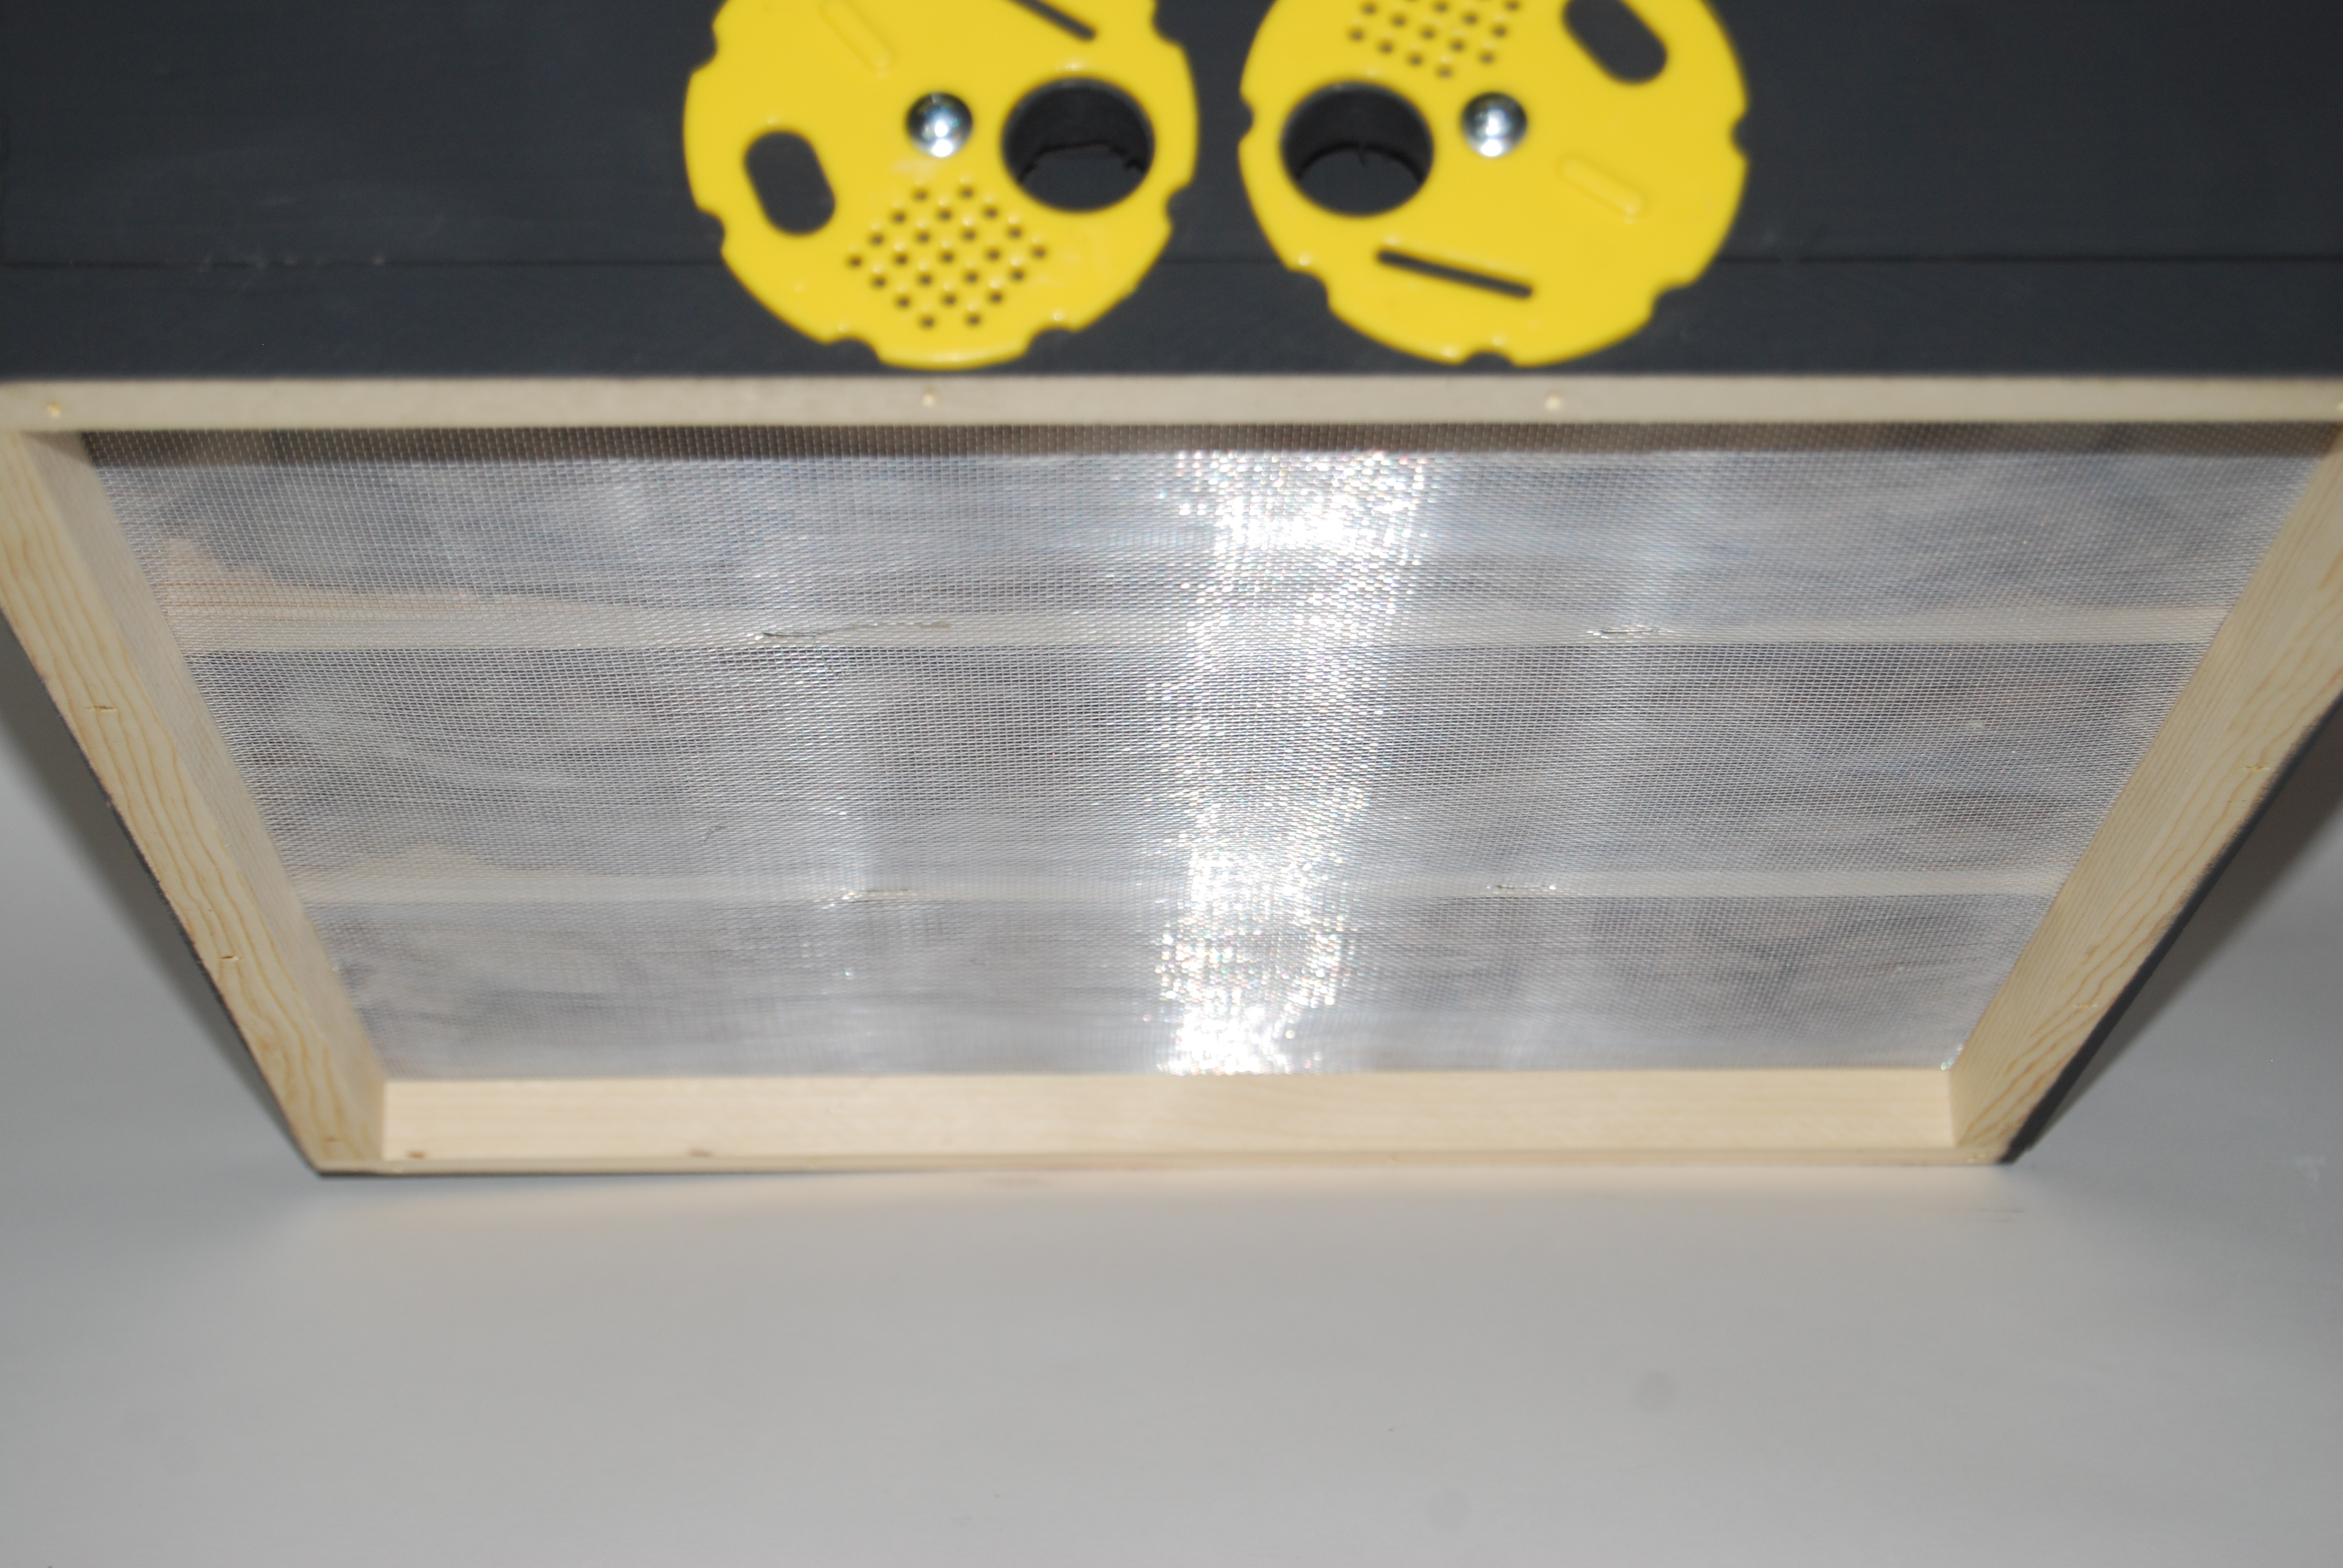 Overwintering Insulation Heater Box